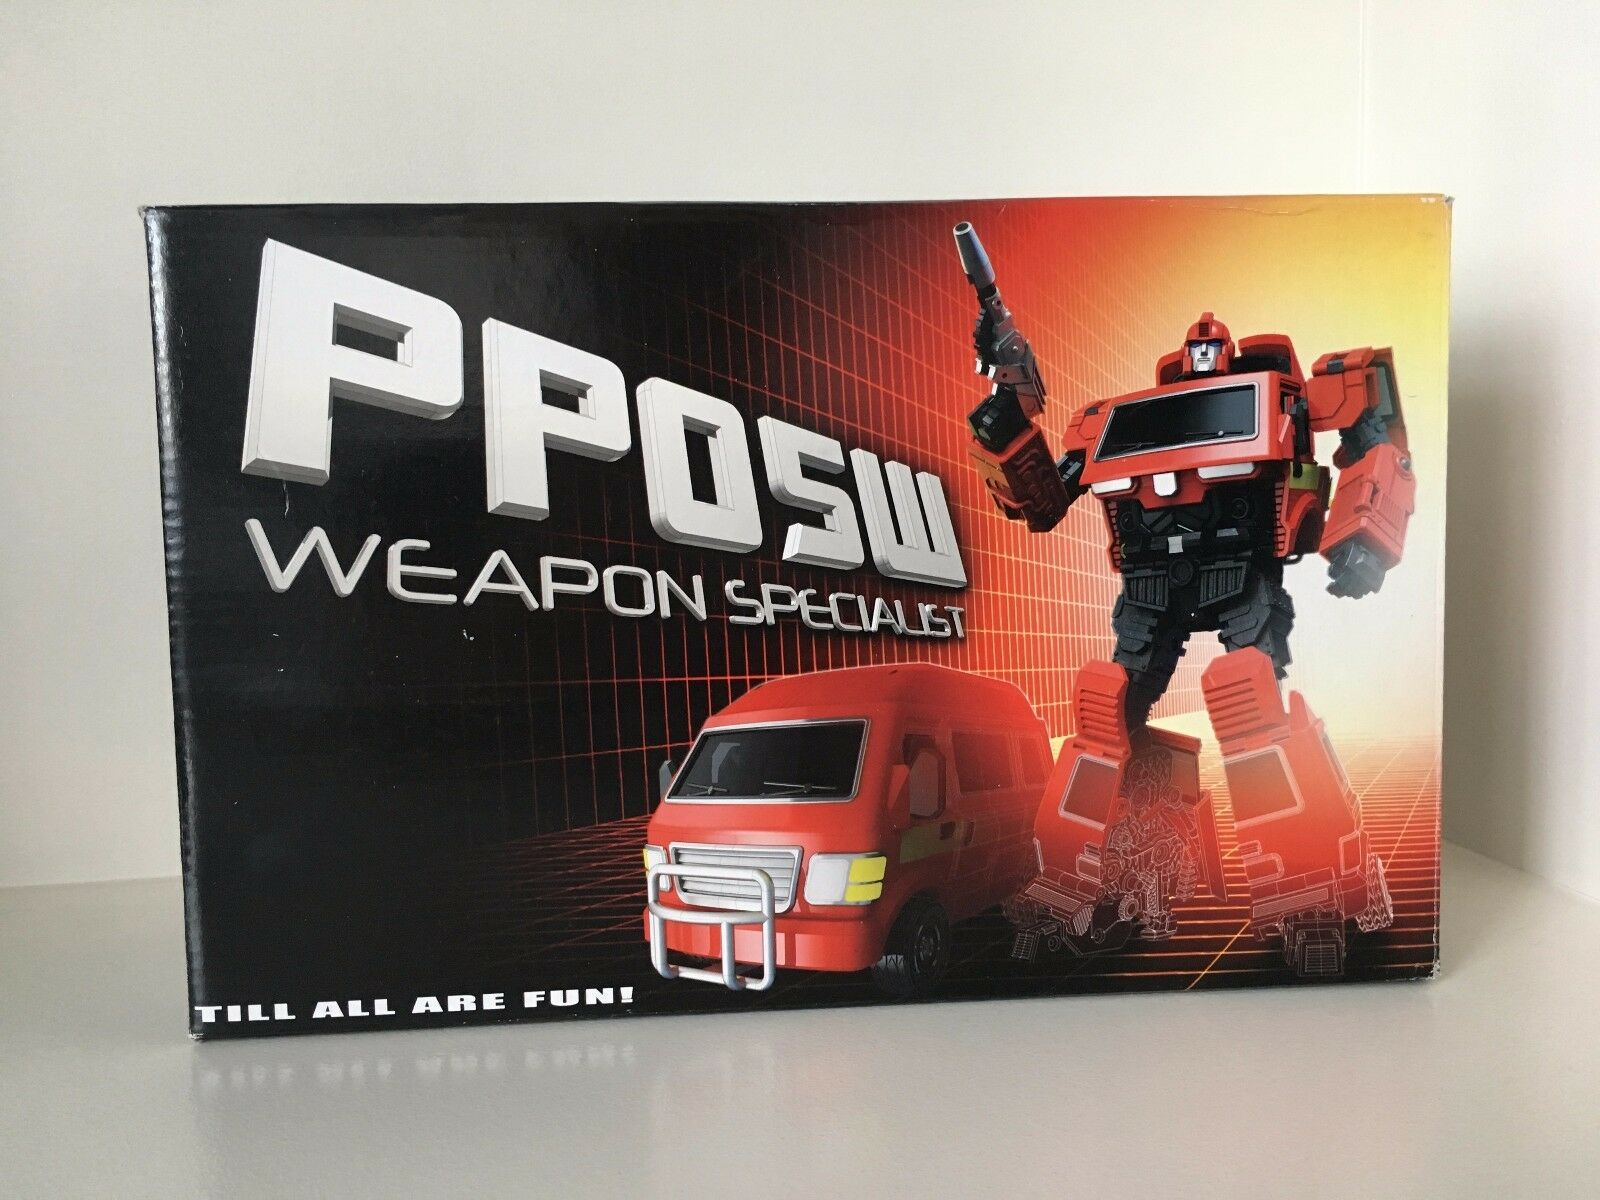 Transformers Masterpiece iGear PP05W Weapons Specialist  aka MP Ironhide MIB